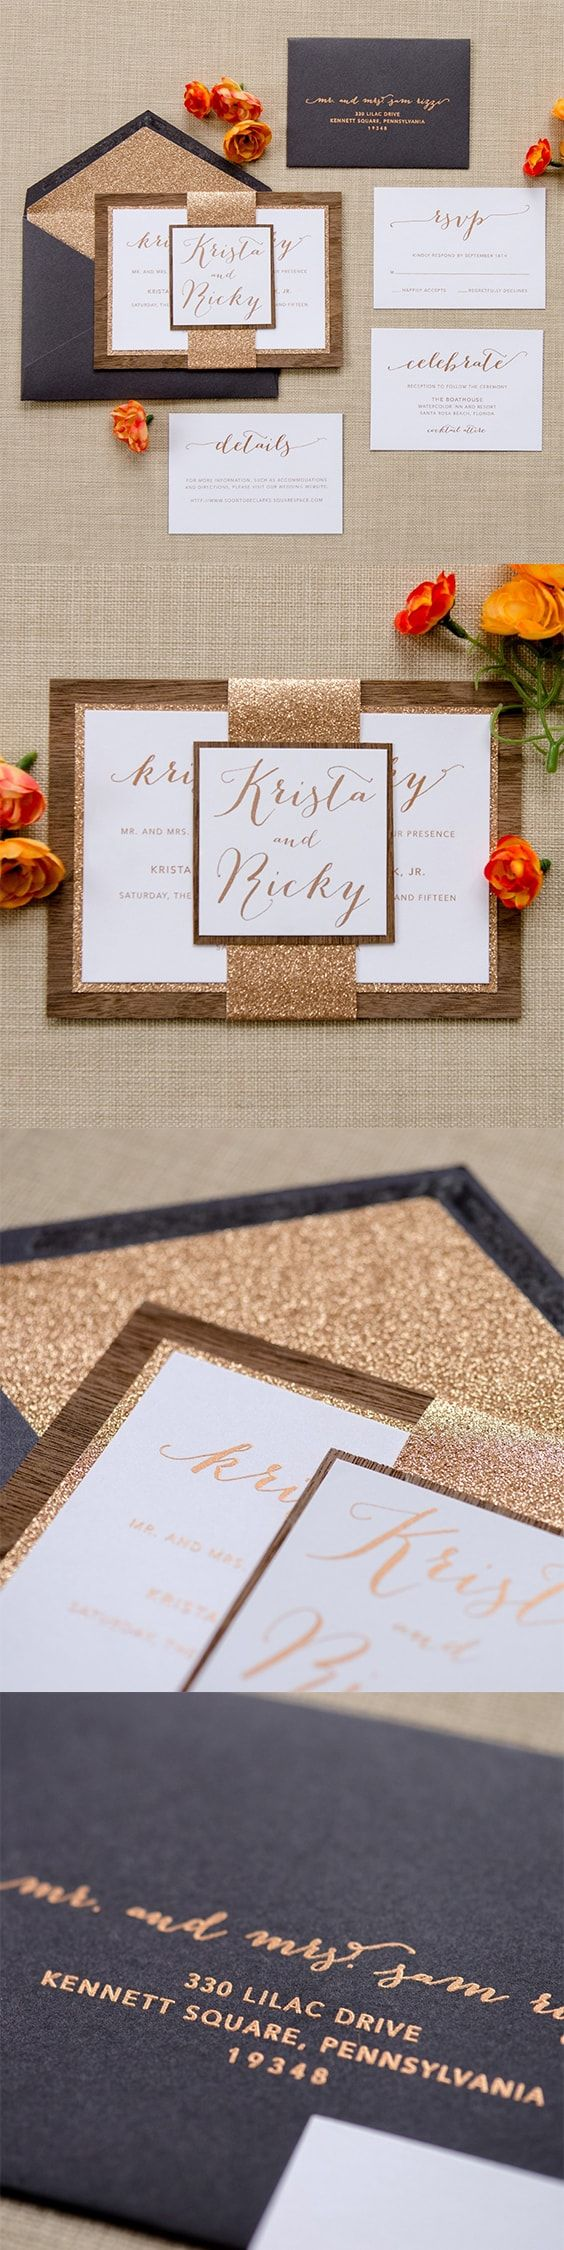 Wood u0026 Glitter Bellyband Wedding Invitation